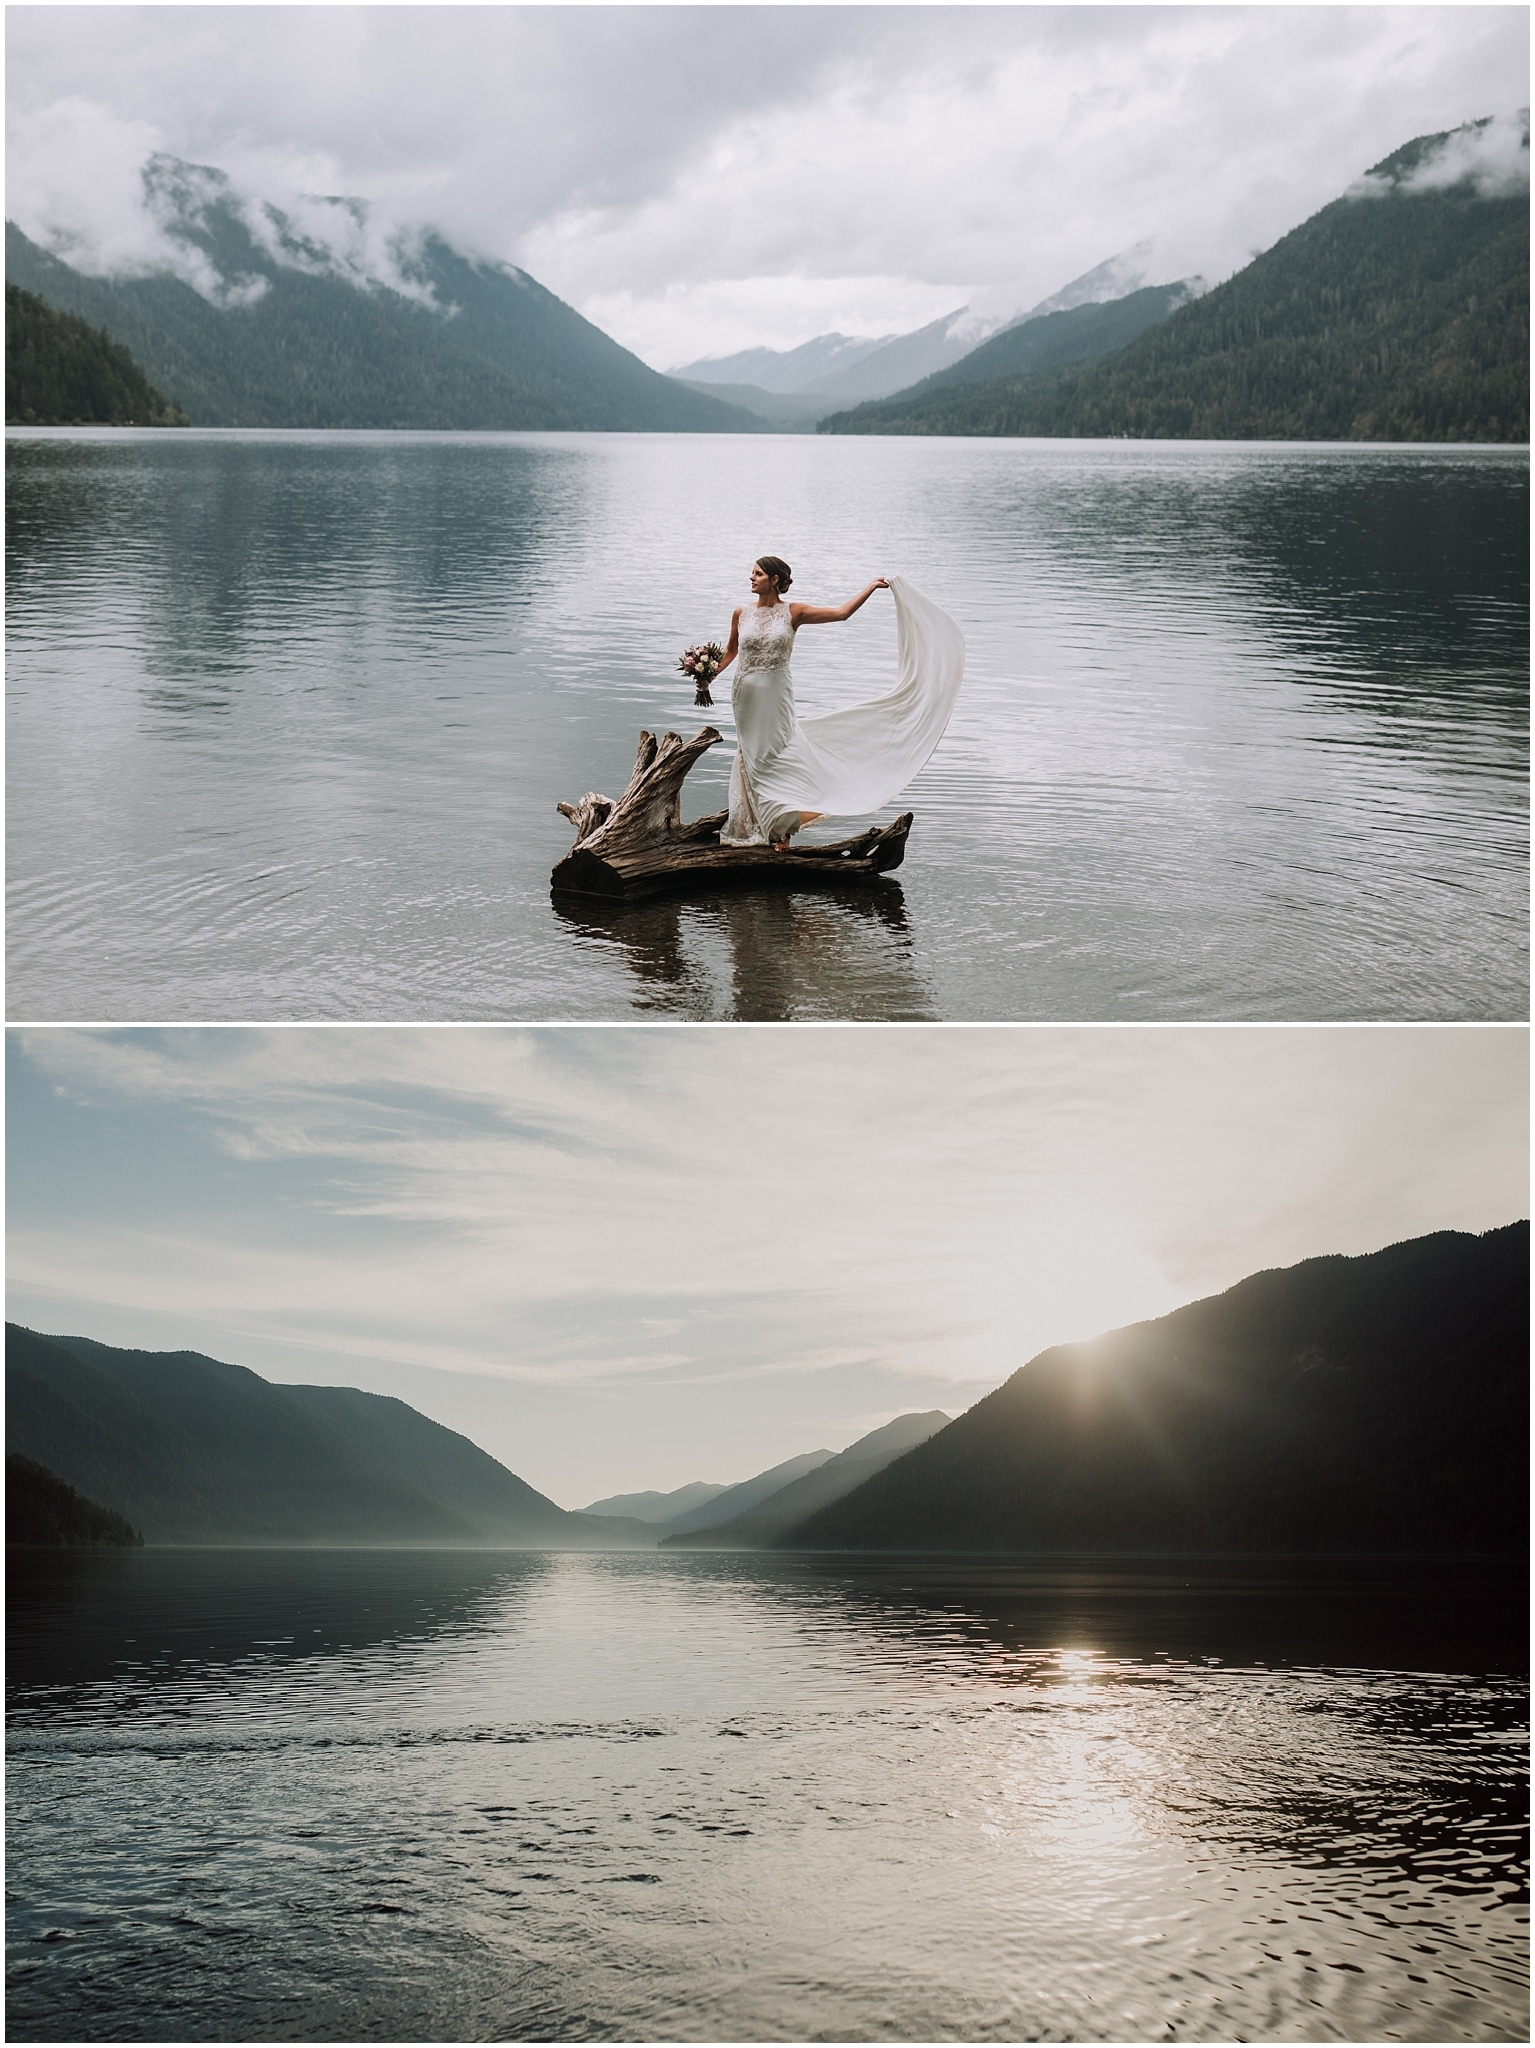 California, Iceland, Adventure, 2018, Lake Crescent, Olympic National Park,